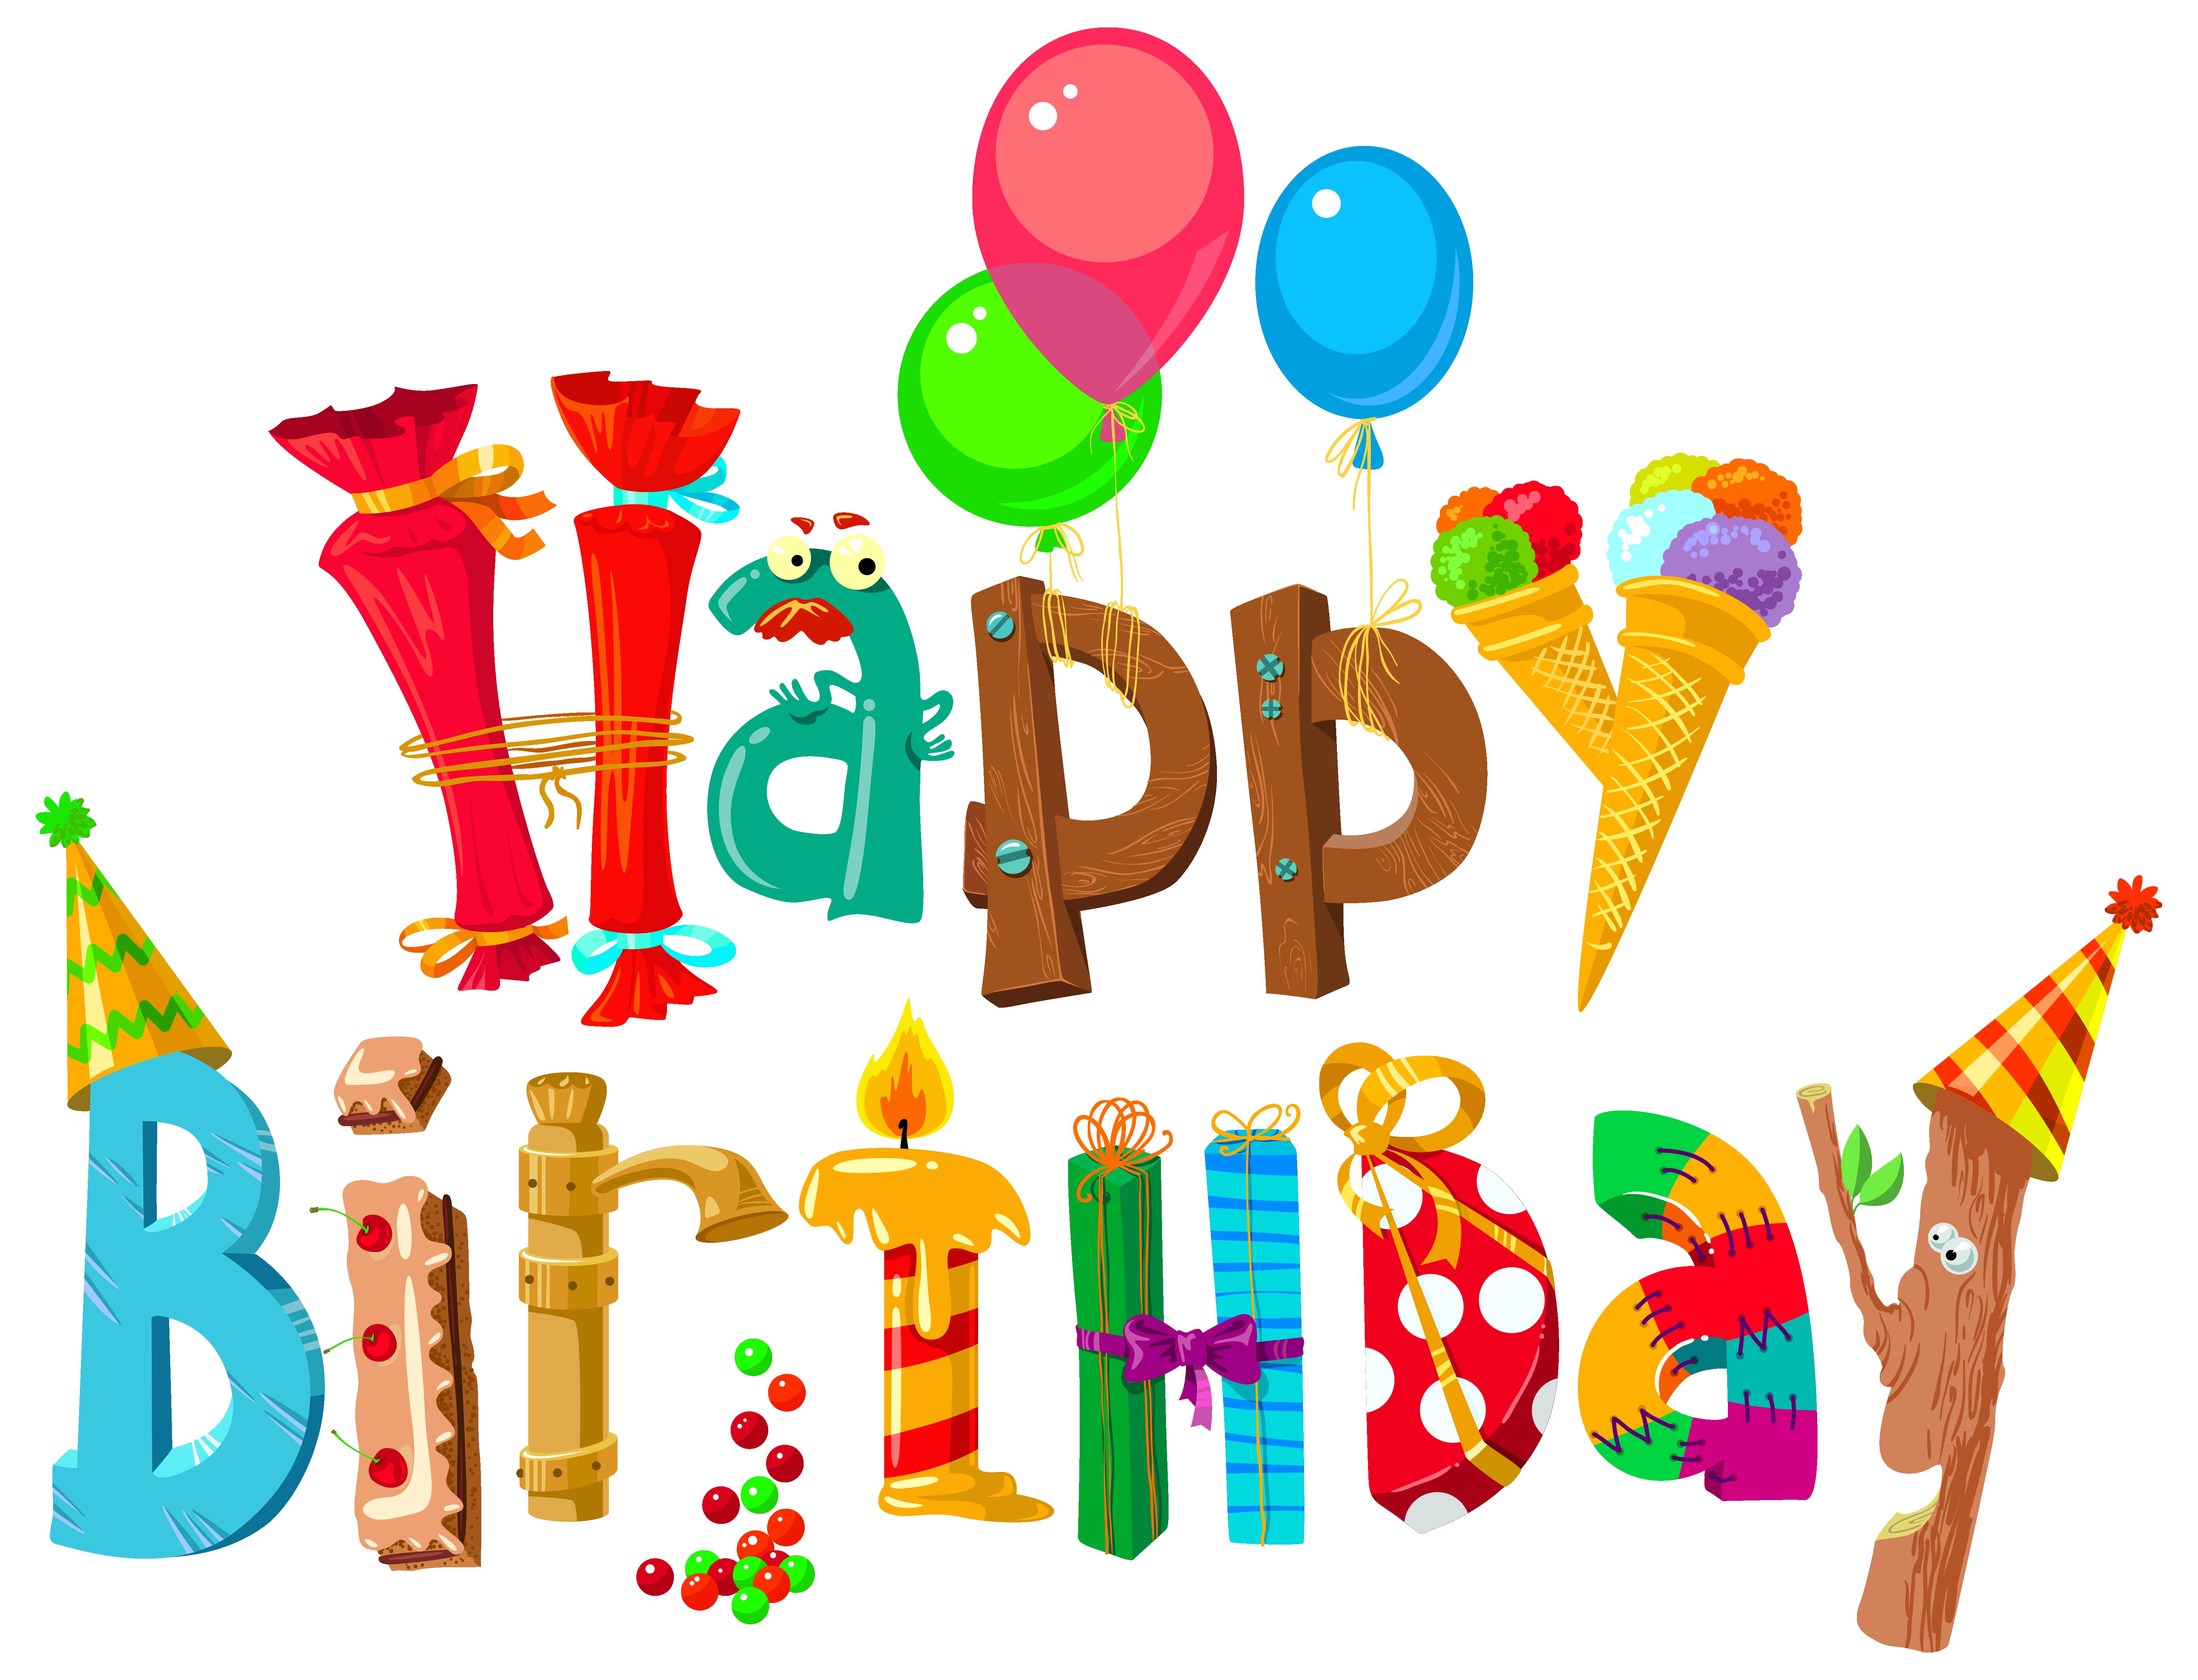 Free birthday birthday clipart .-Free birthday birthday clipart .-0